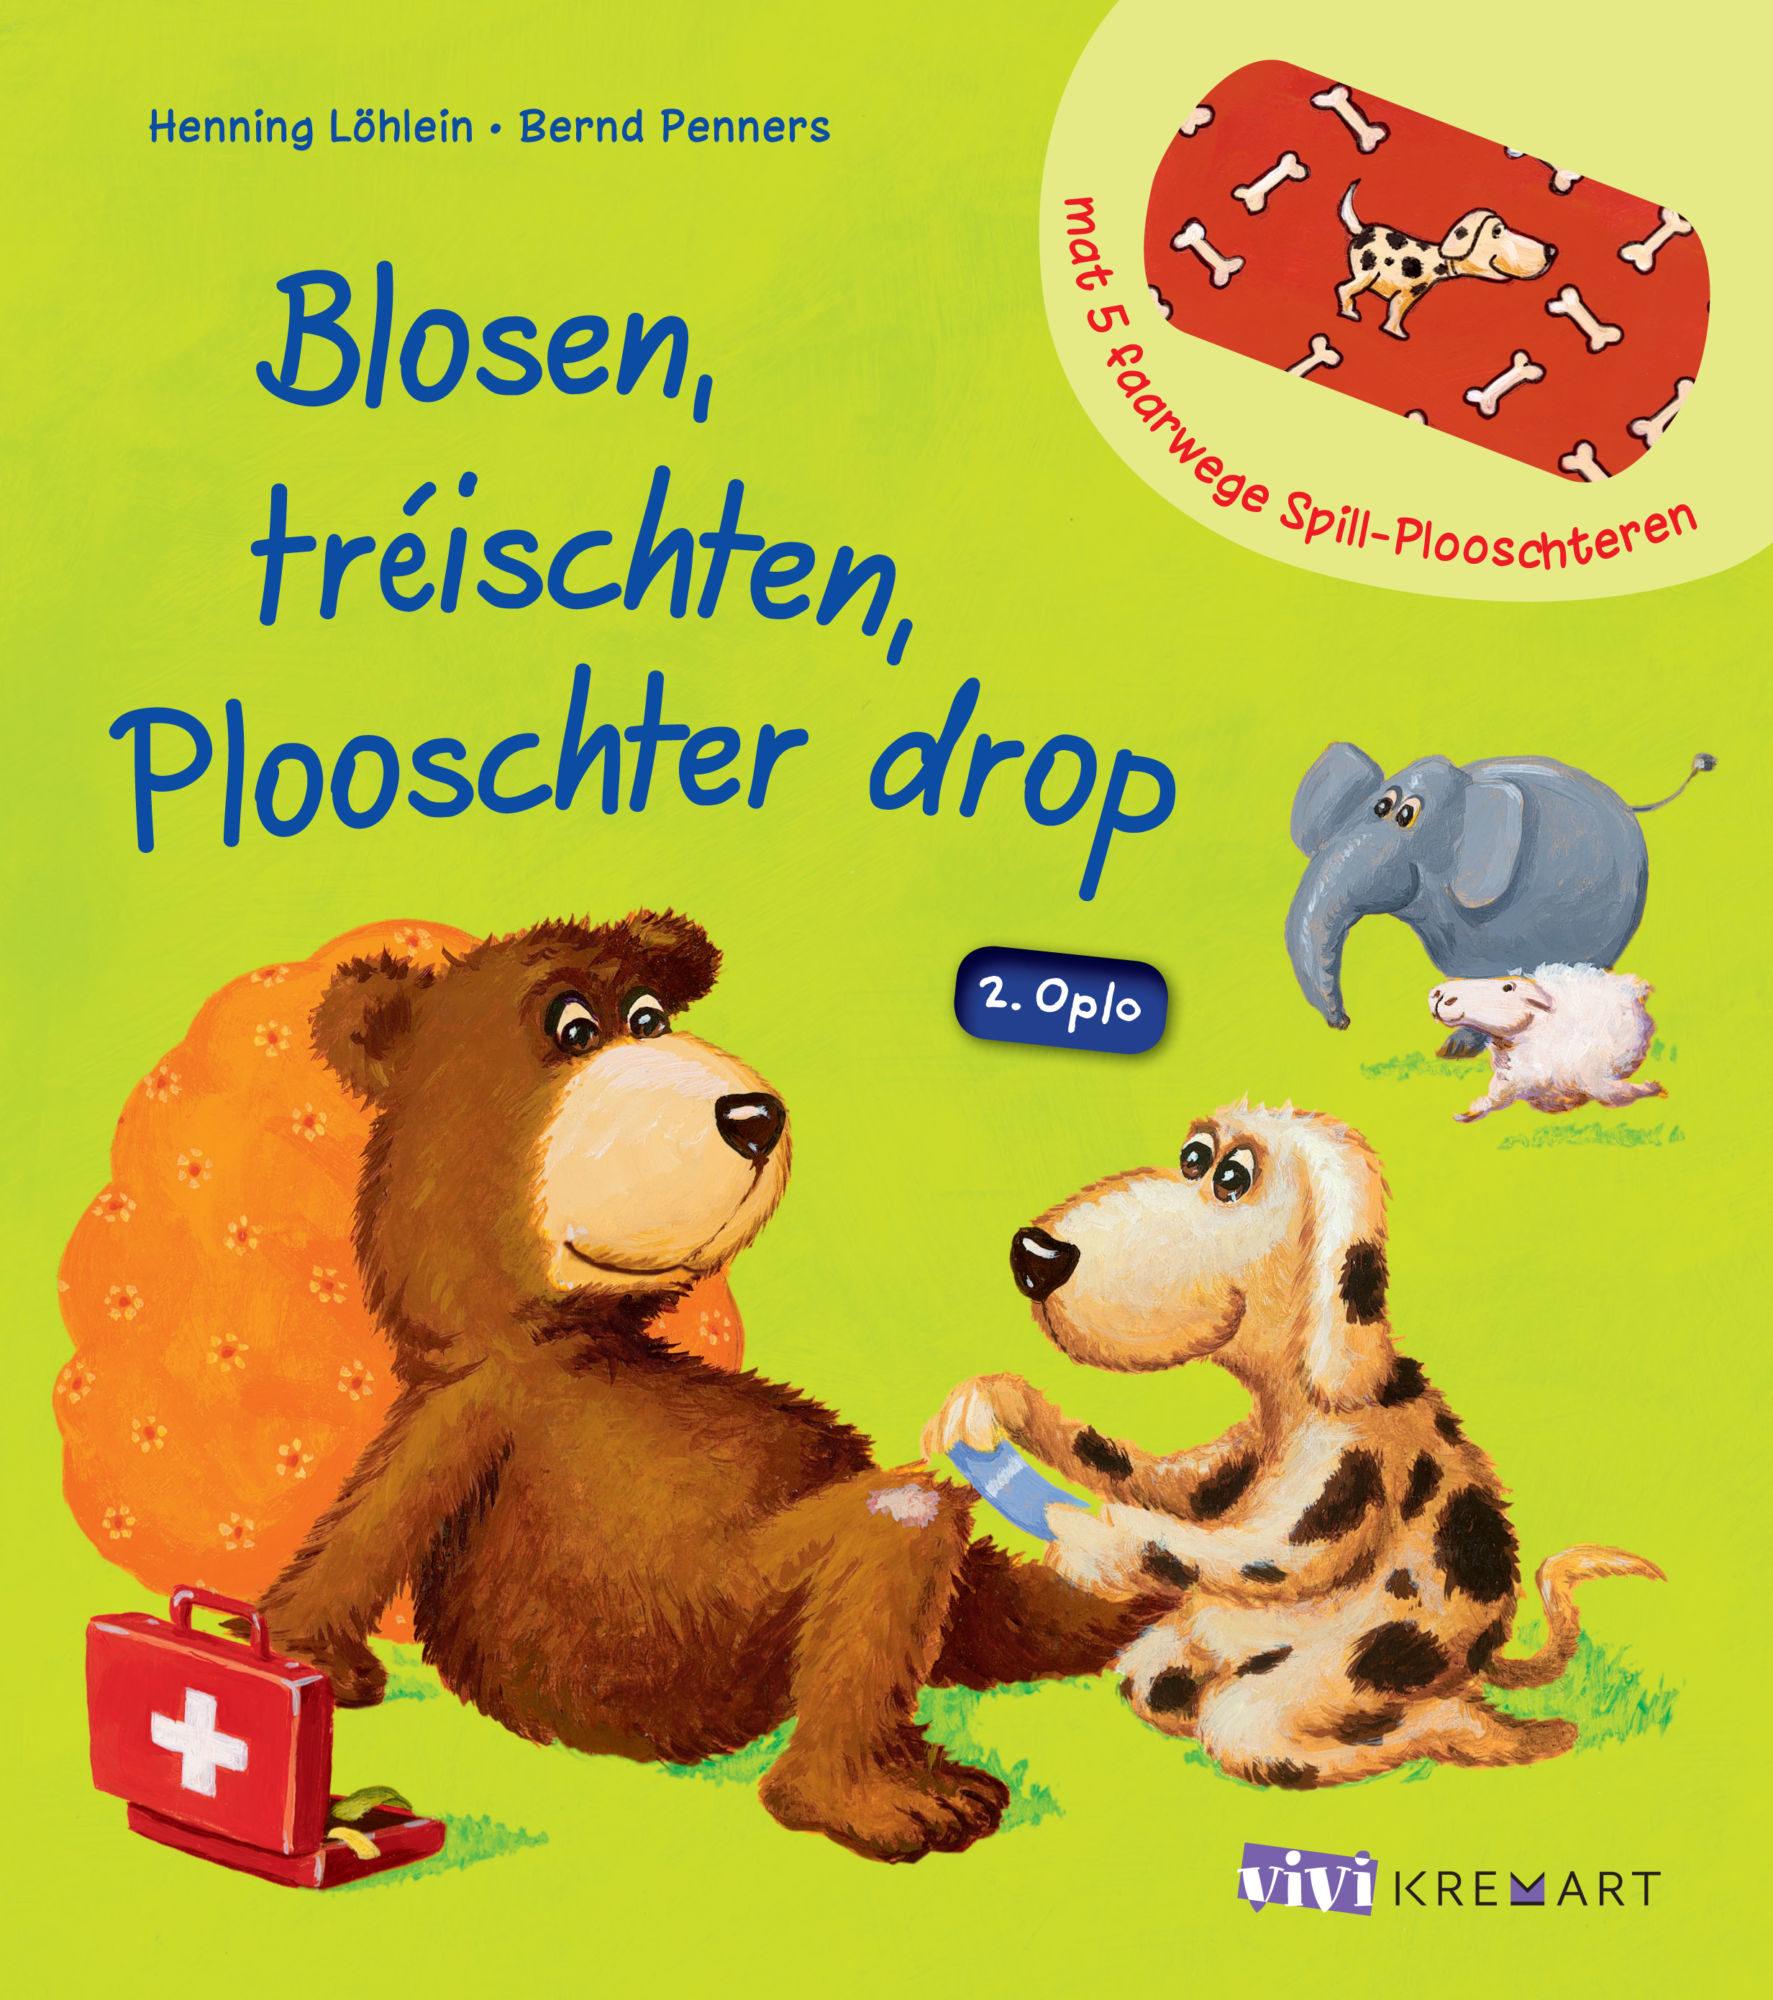 Plooschterbuch_Cover_LU_2Oplo.indd